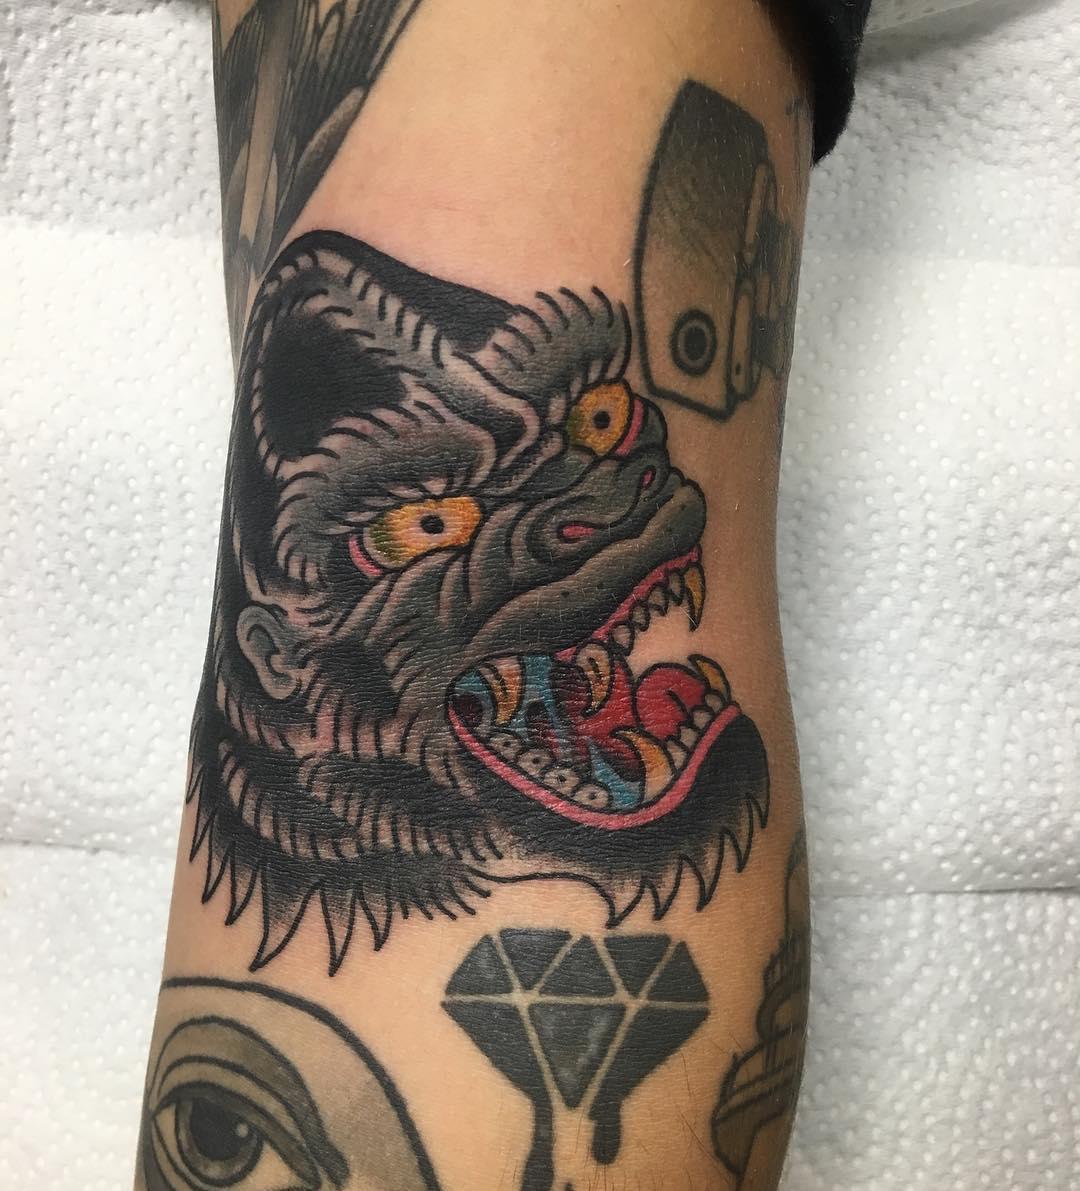 tumblr-reuben-todd-kapala-tattoo